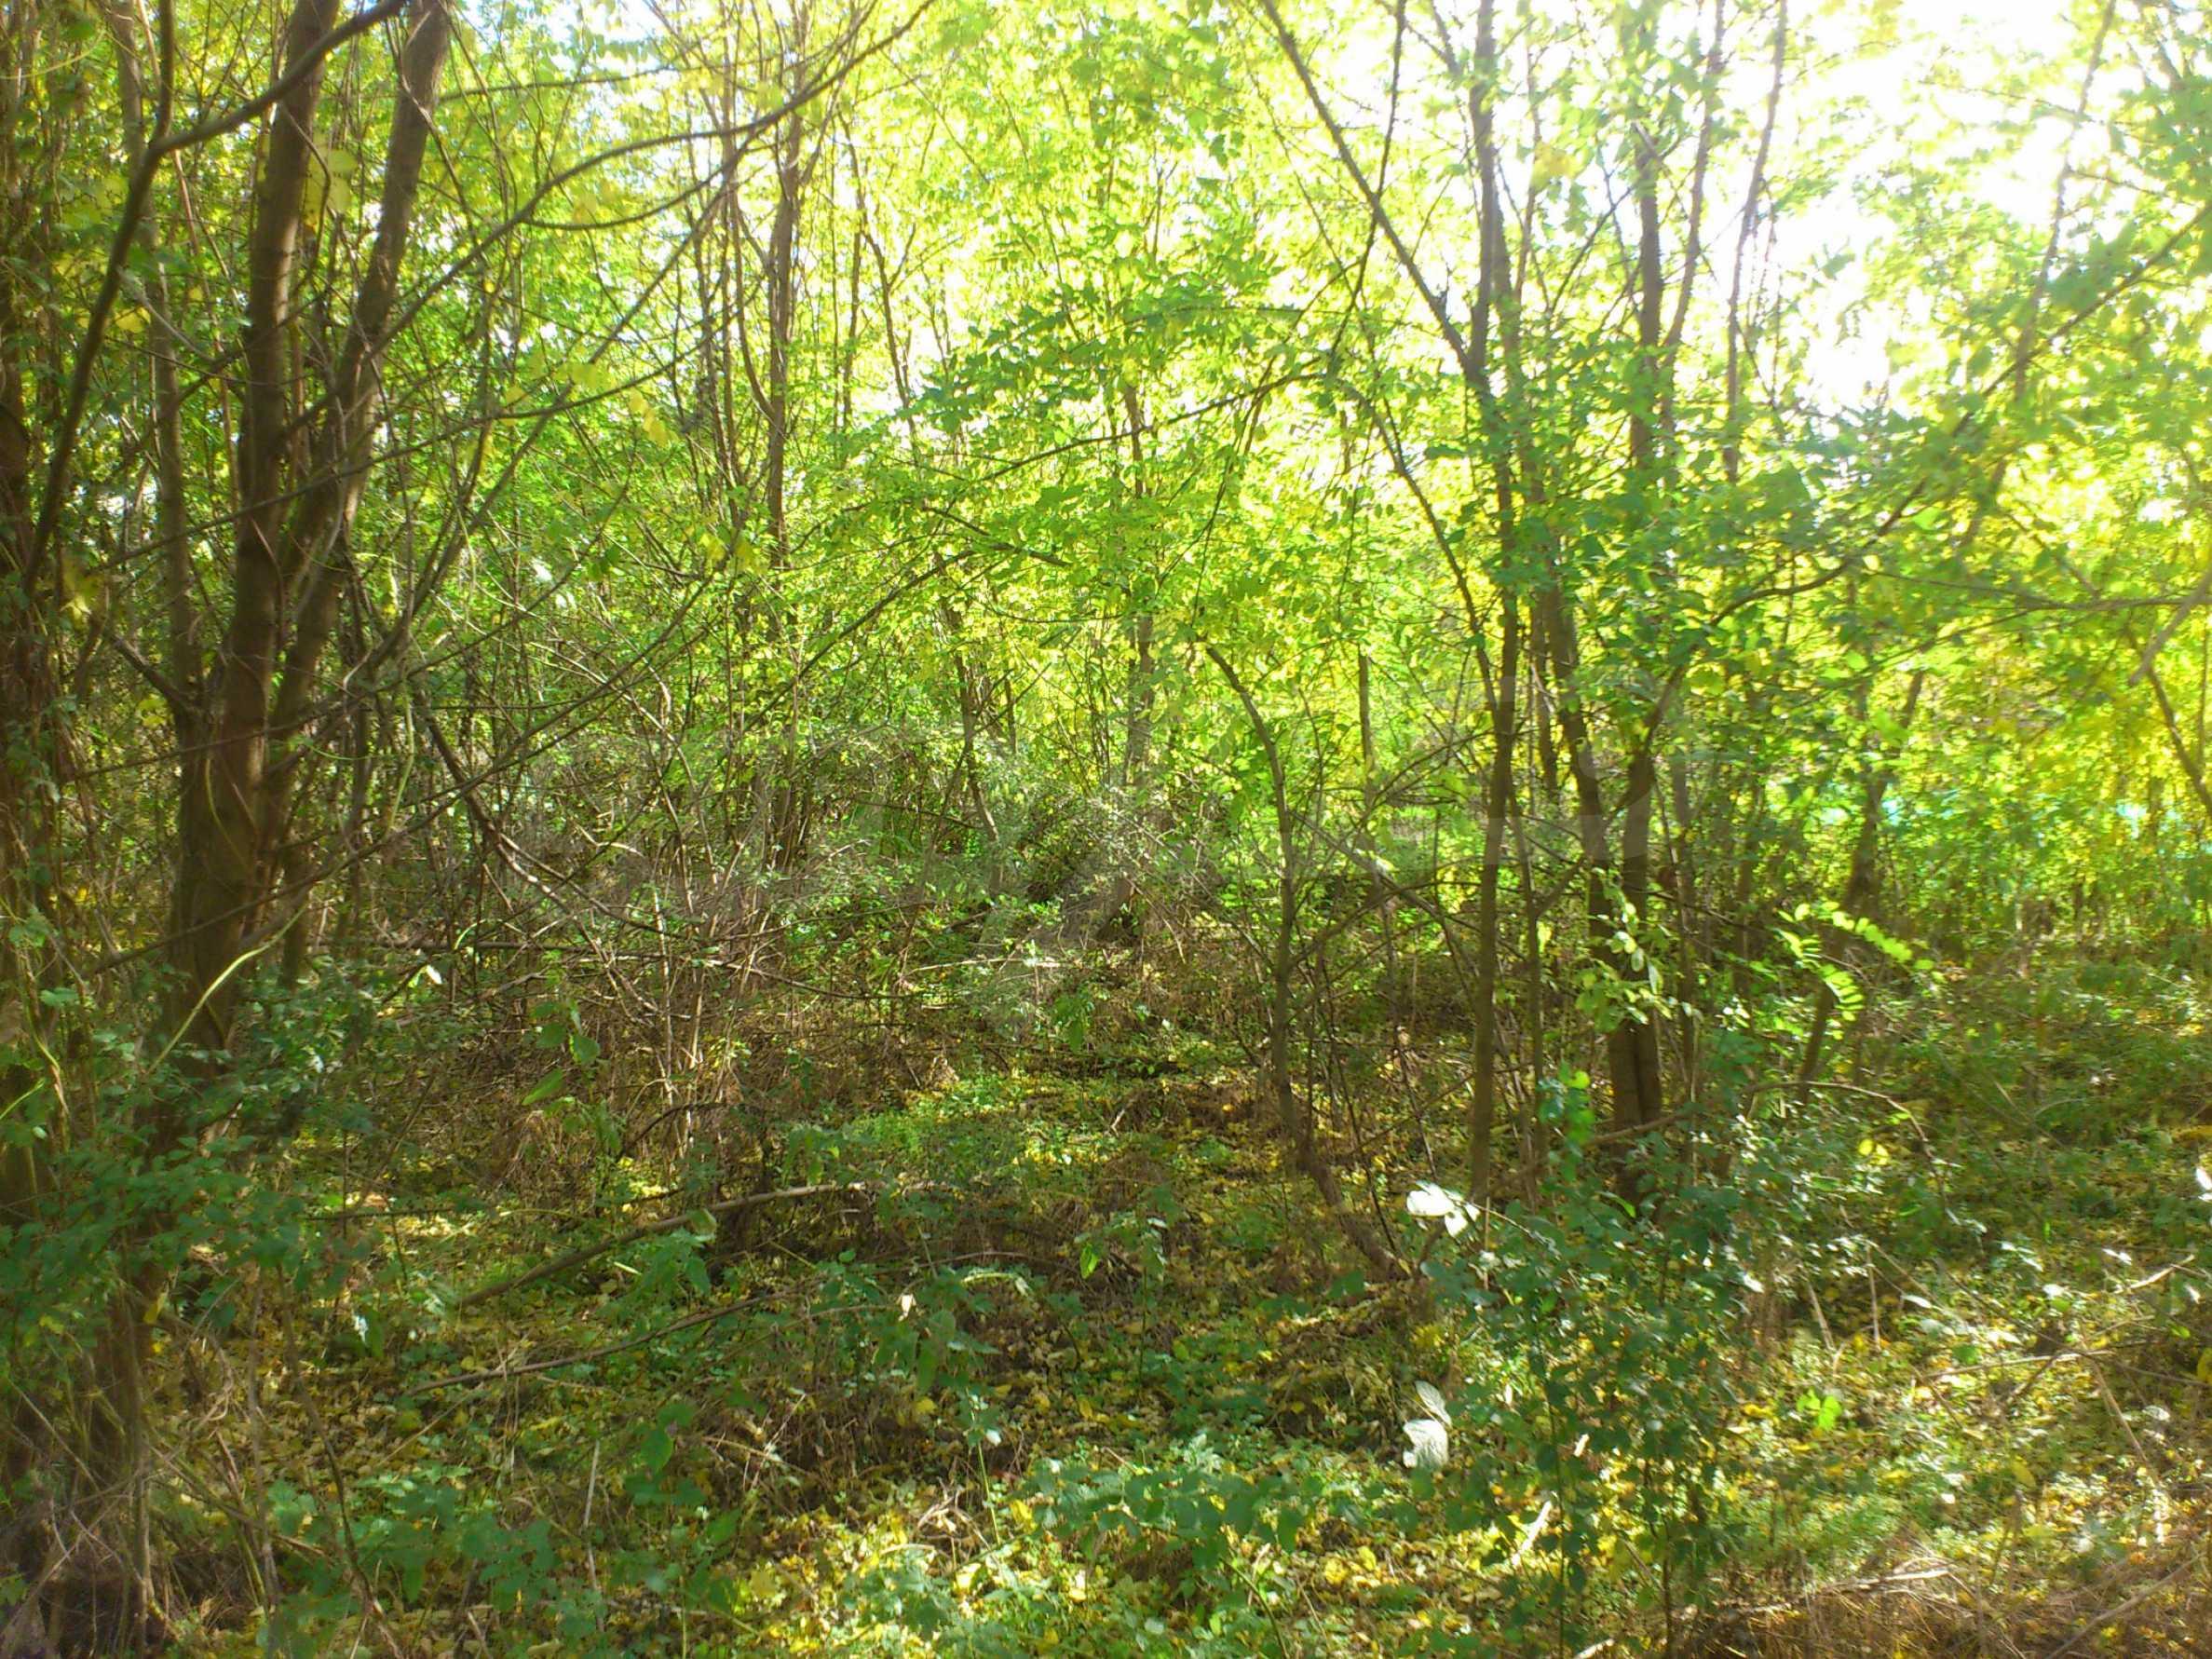 Hof nur 17 km von Veliko Tarnovo entfernt 8